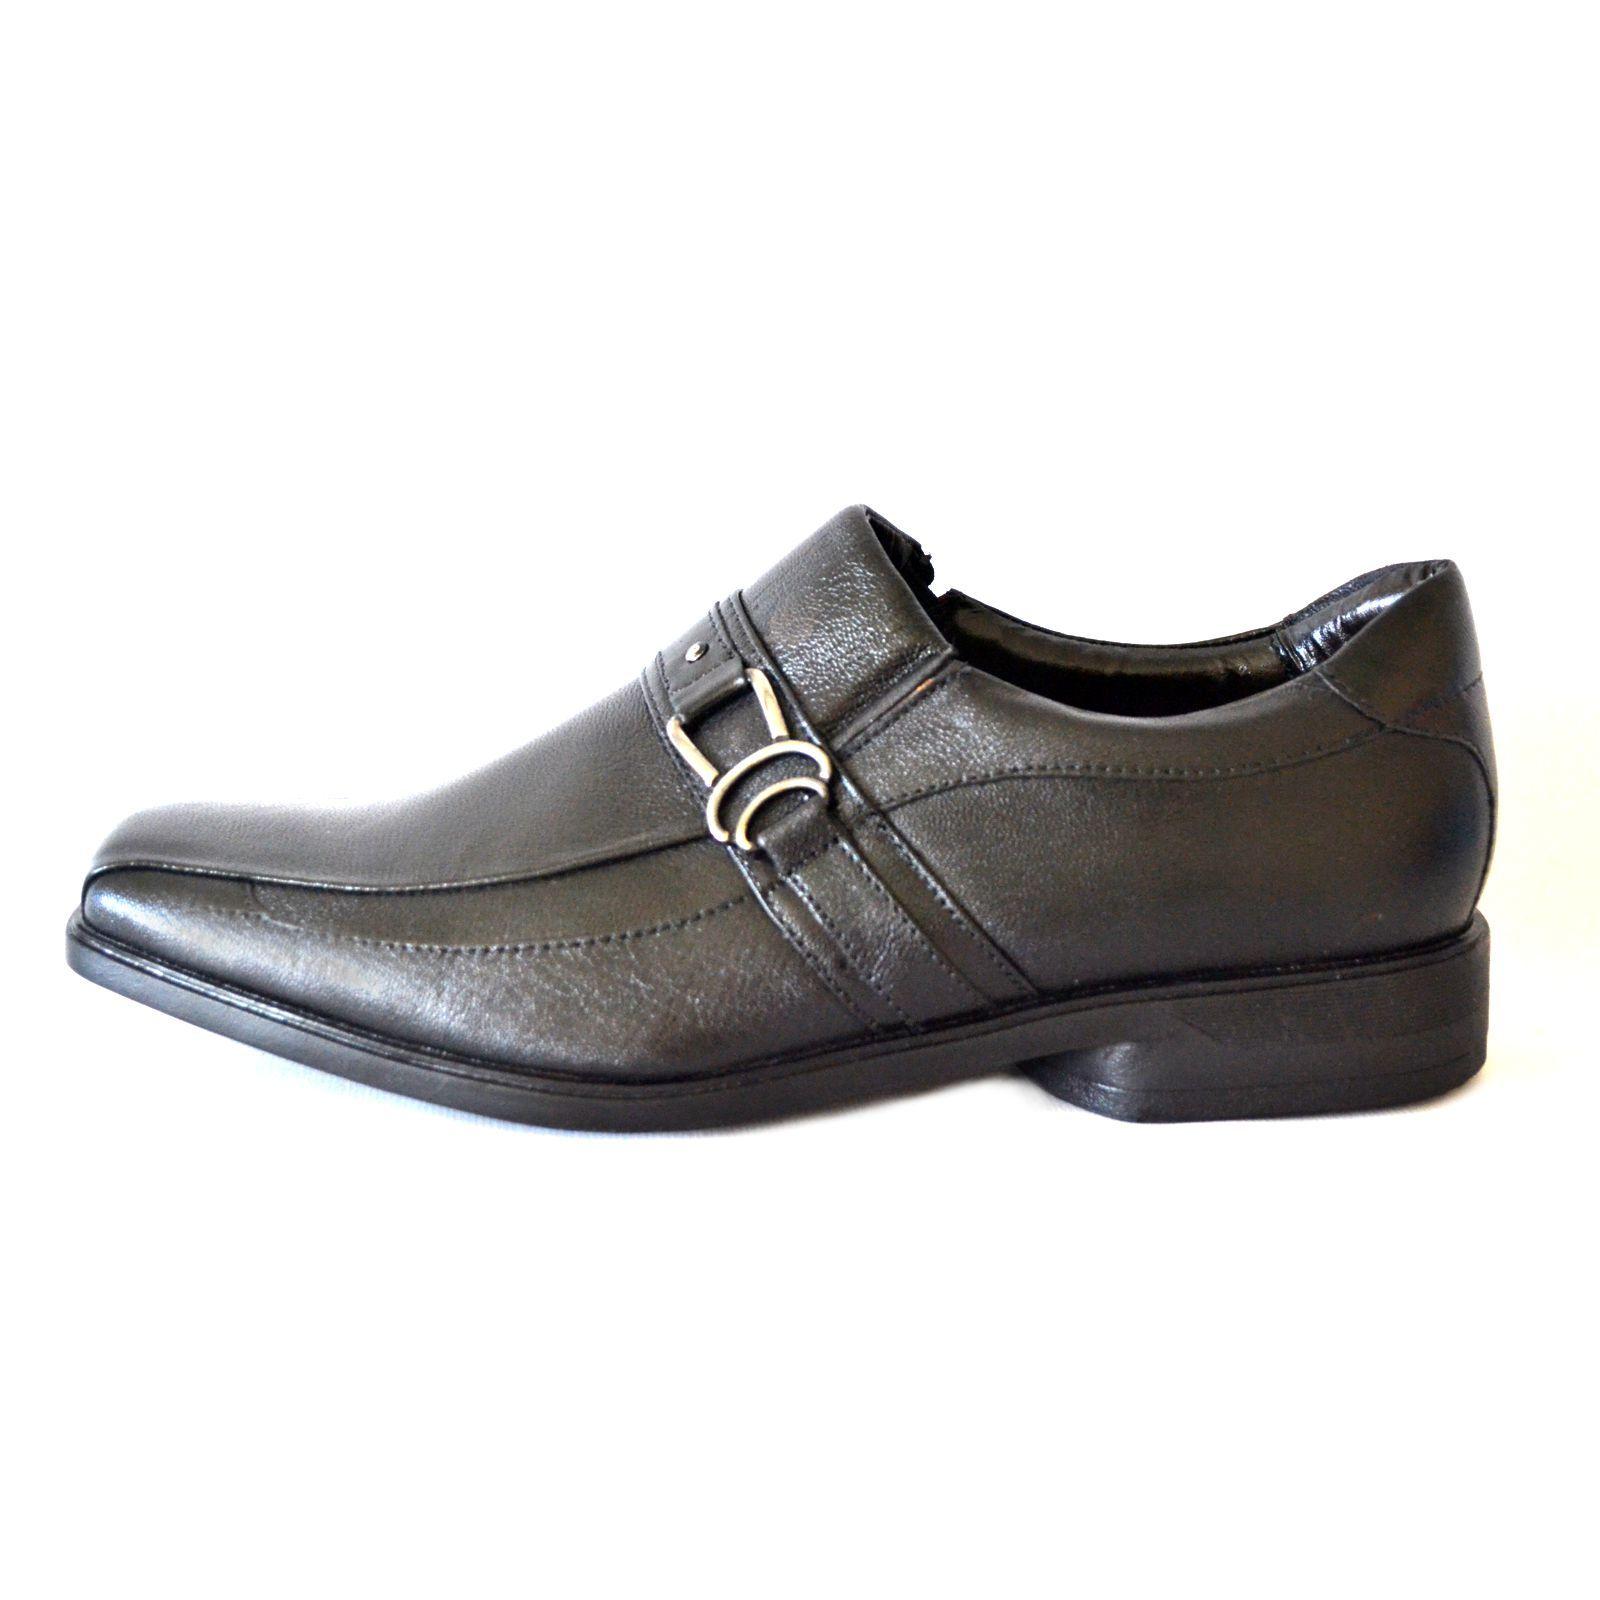 Sapato Prata Couro 1009480 Mestiço Preto